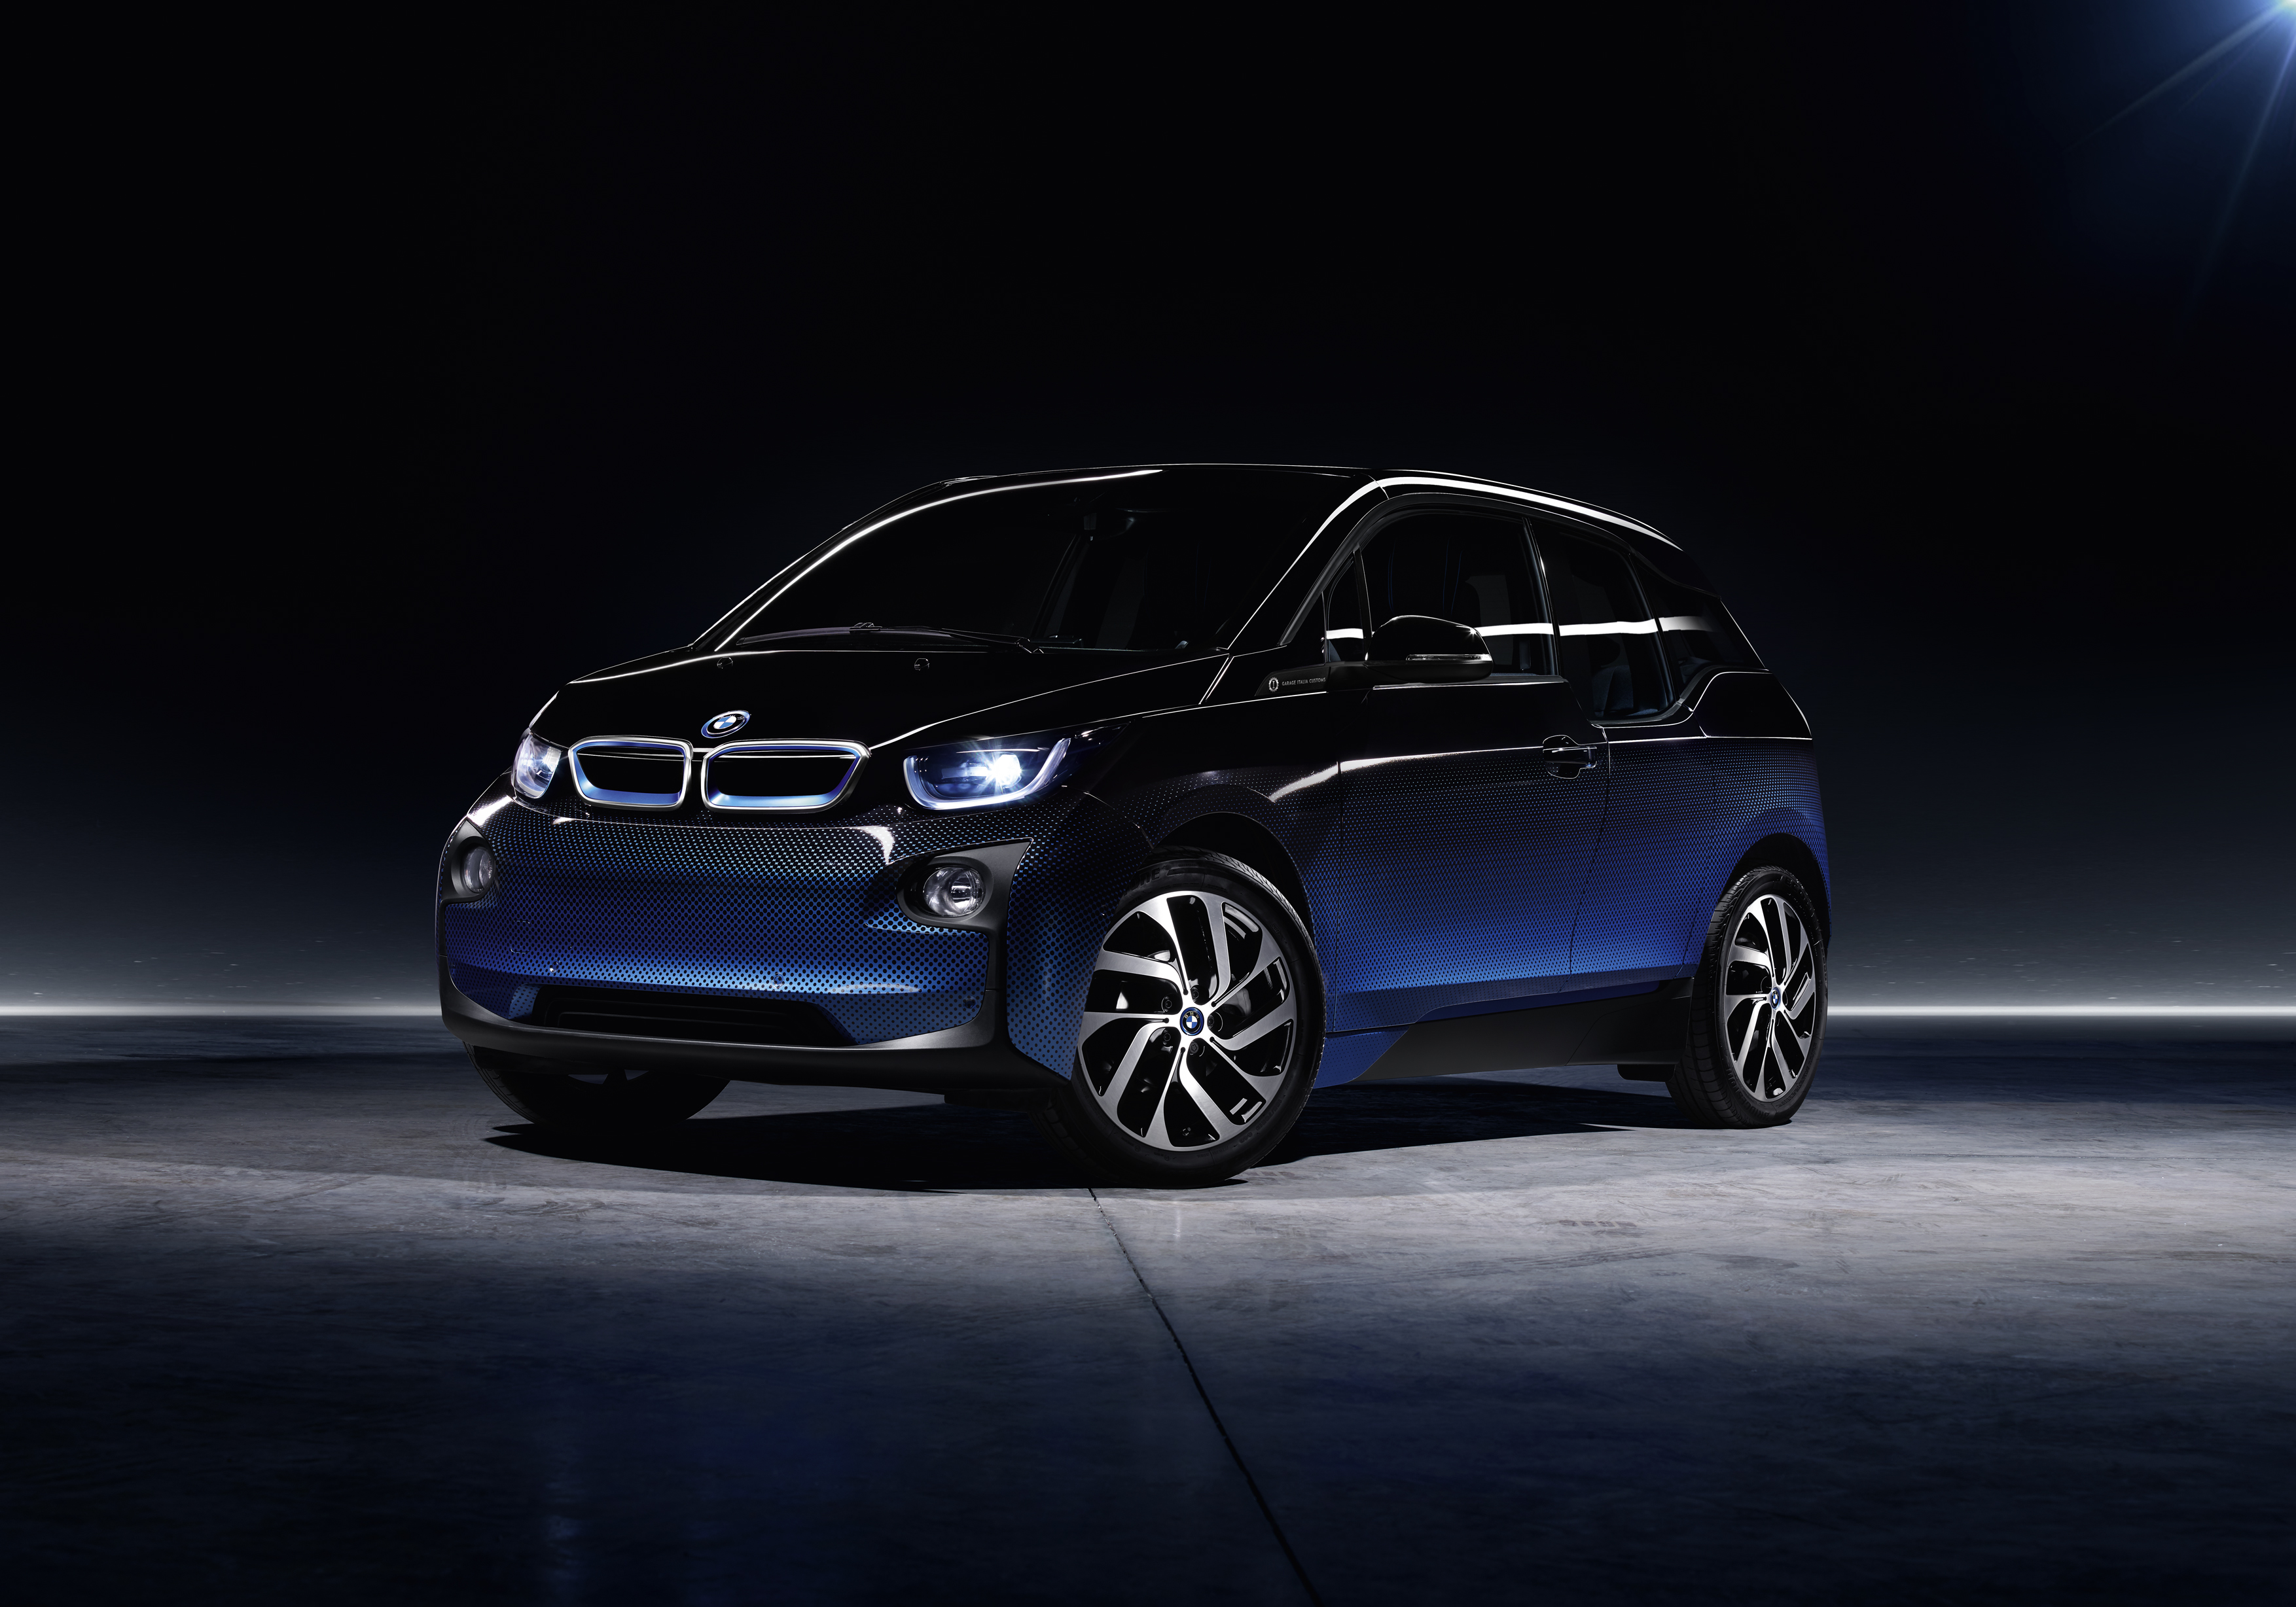 The BMW i3 electric car.